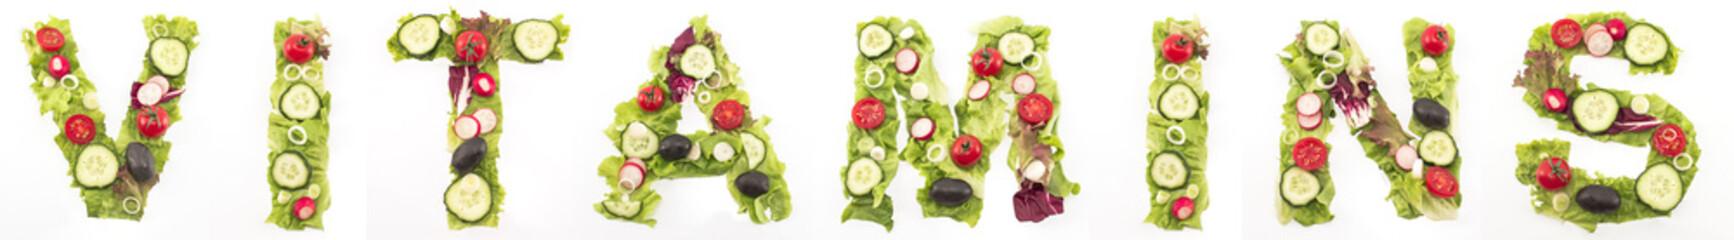 Word vitamins made of salad